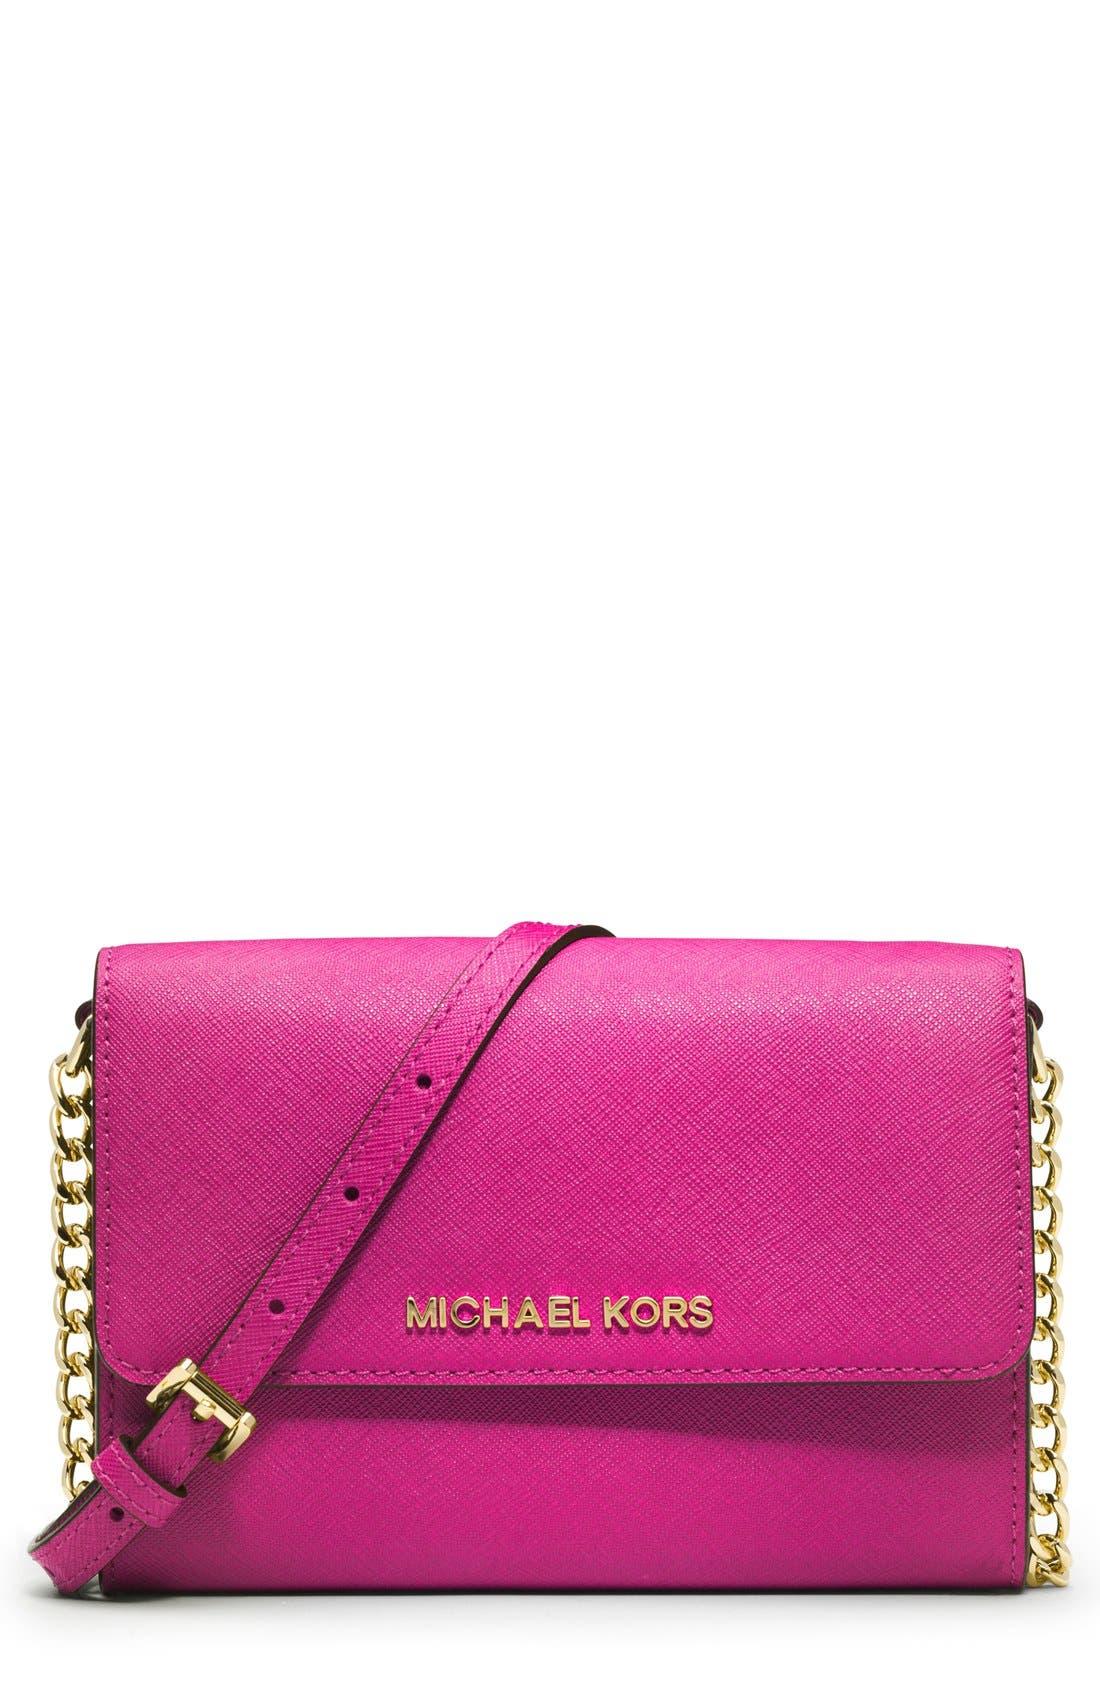 Main Image - MICHAEL Michael Kors 'Jet Set - Large Phone' Saffiano Leather Crossbody Bag